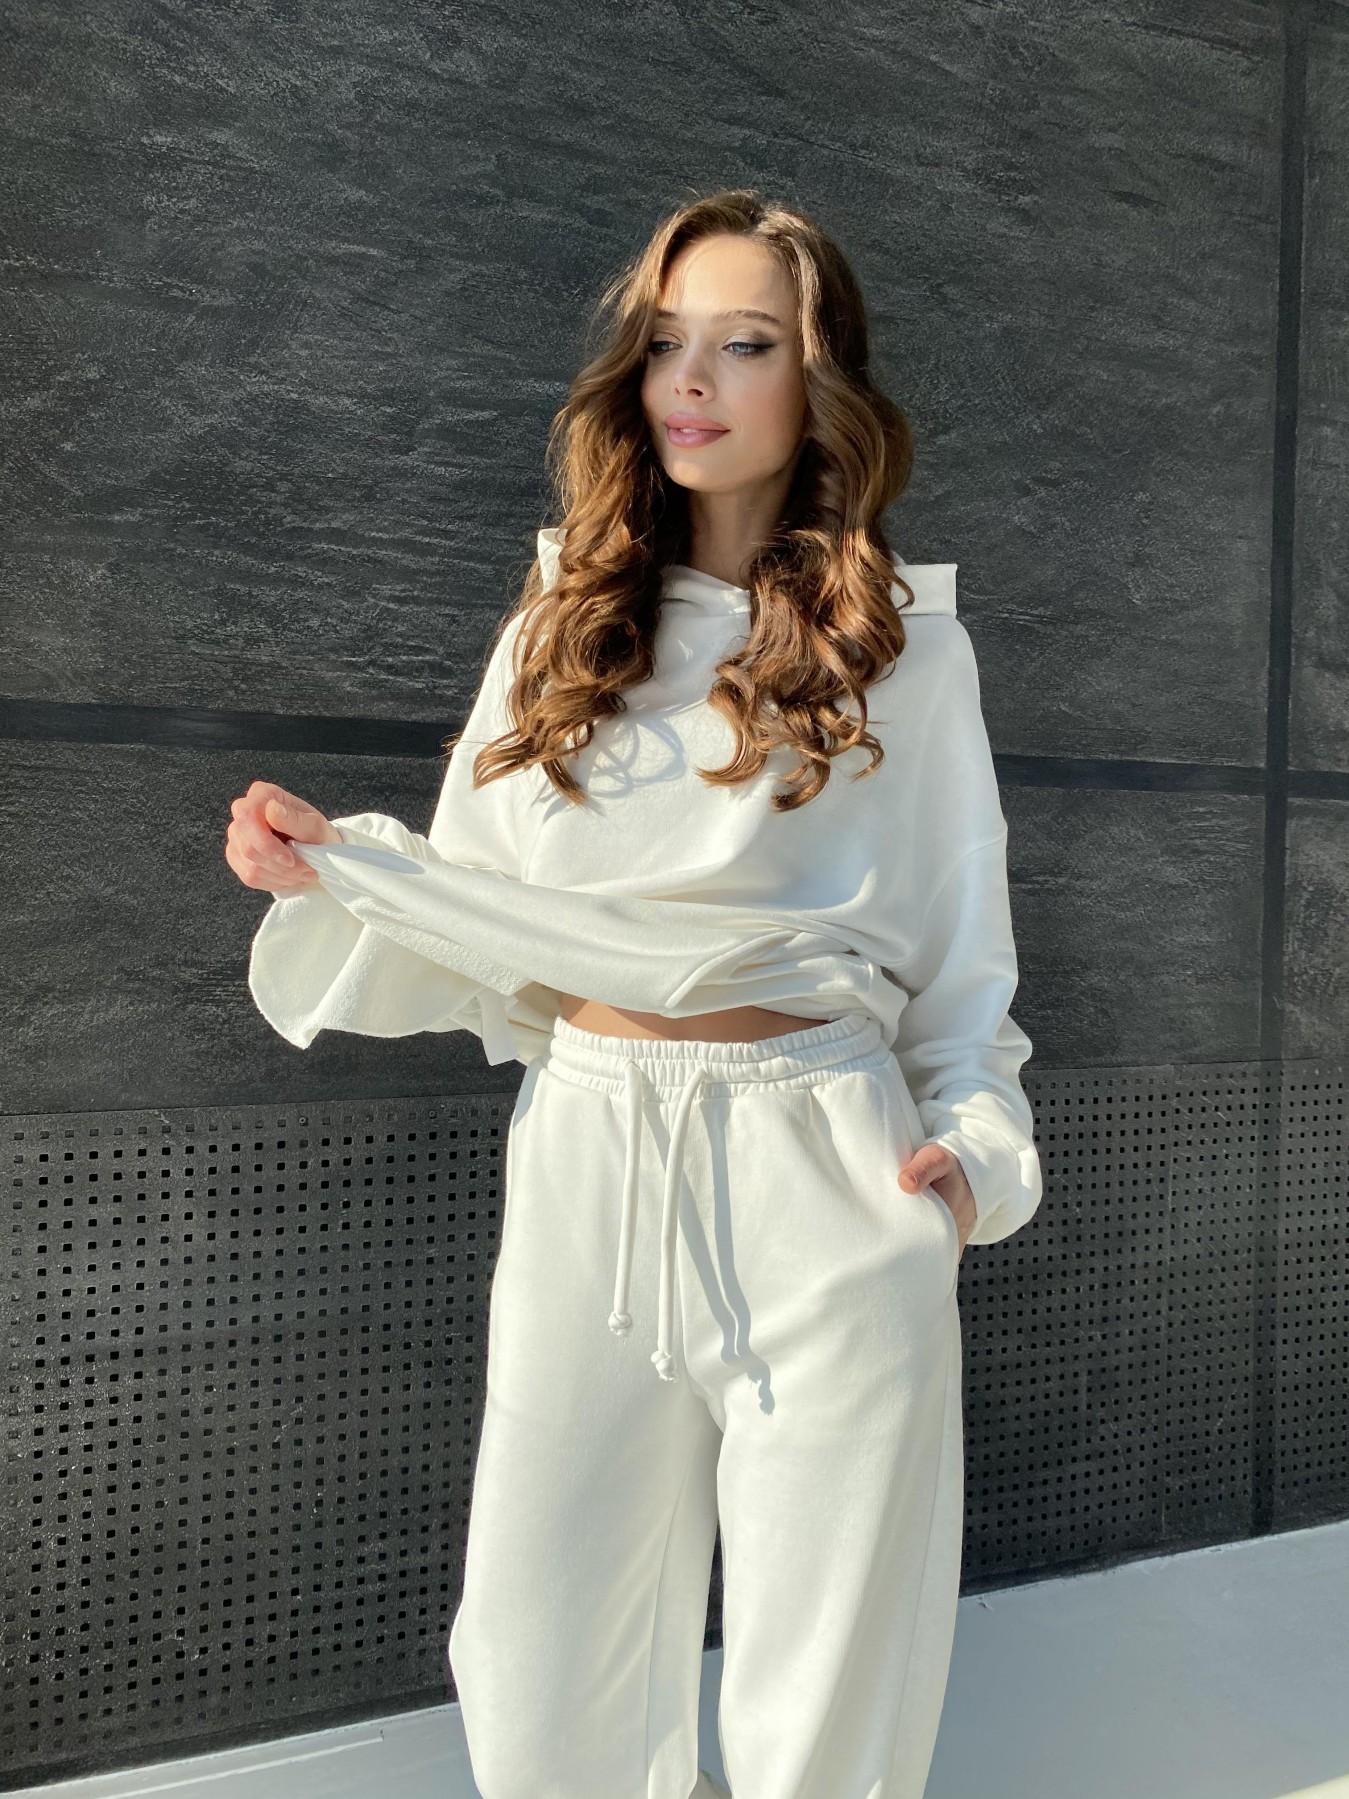 Марион костюм из 3х нитки 10581 АРТ. 47159 Цвет: Молоко - фото 4, интернет магазин tm-modus.ru